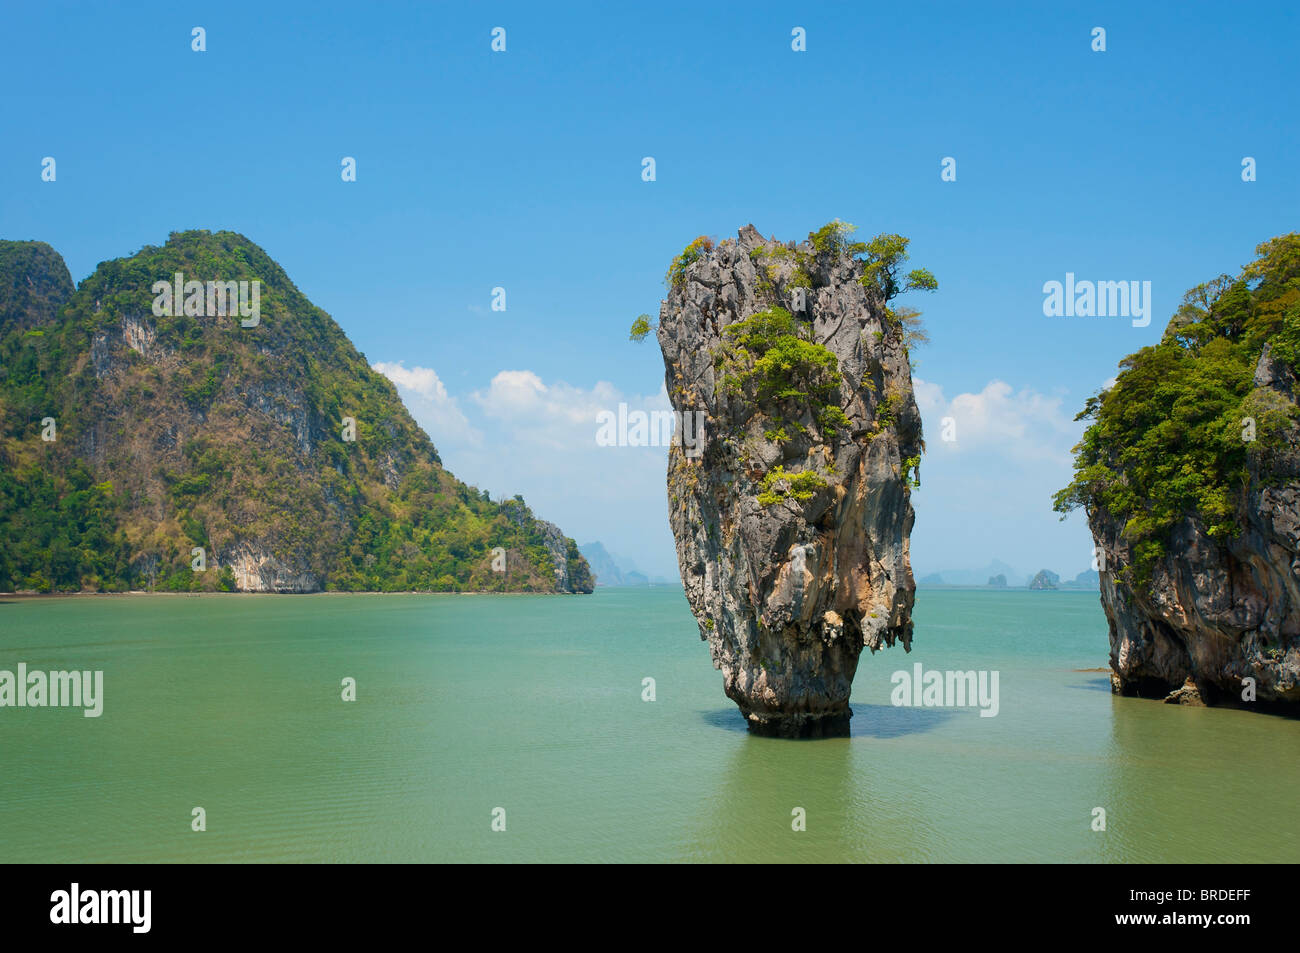 La isla de James Bond, Phang Nga Bay National Park, Phuket, Tailandia Imagen De Stock